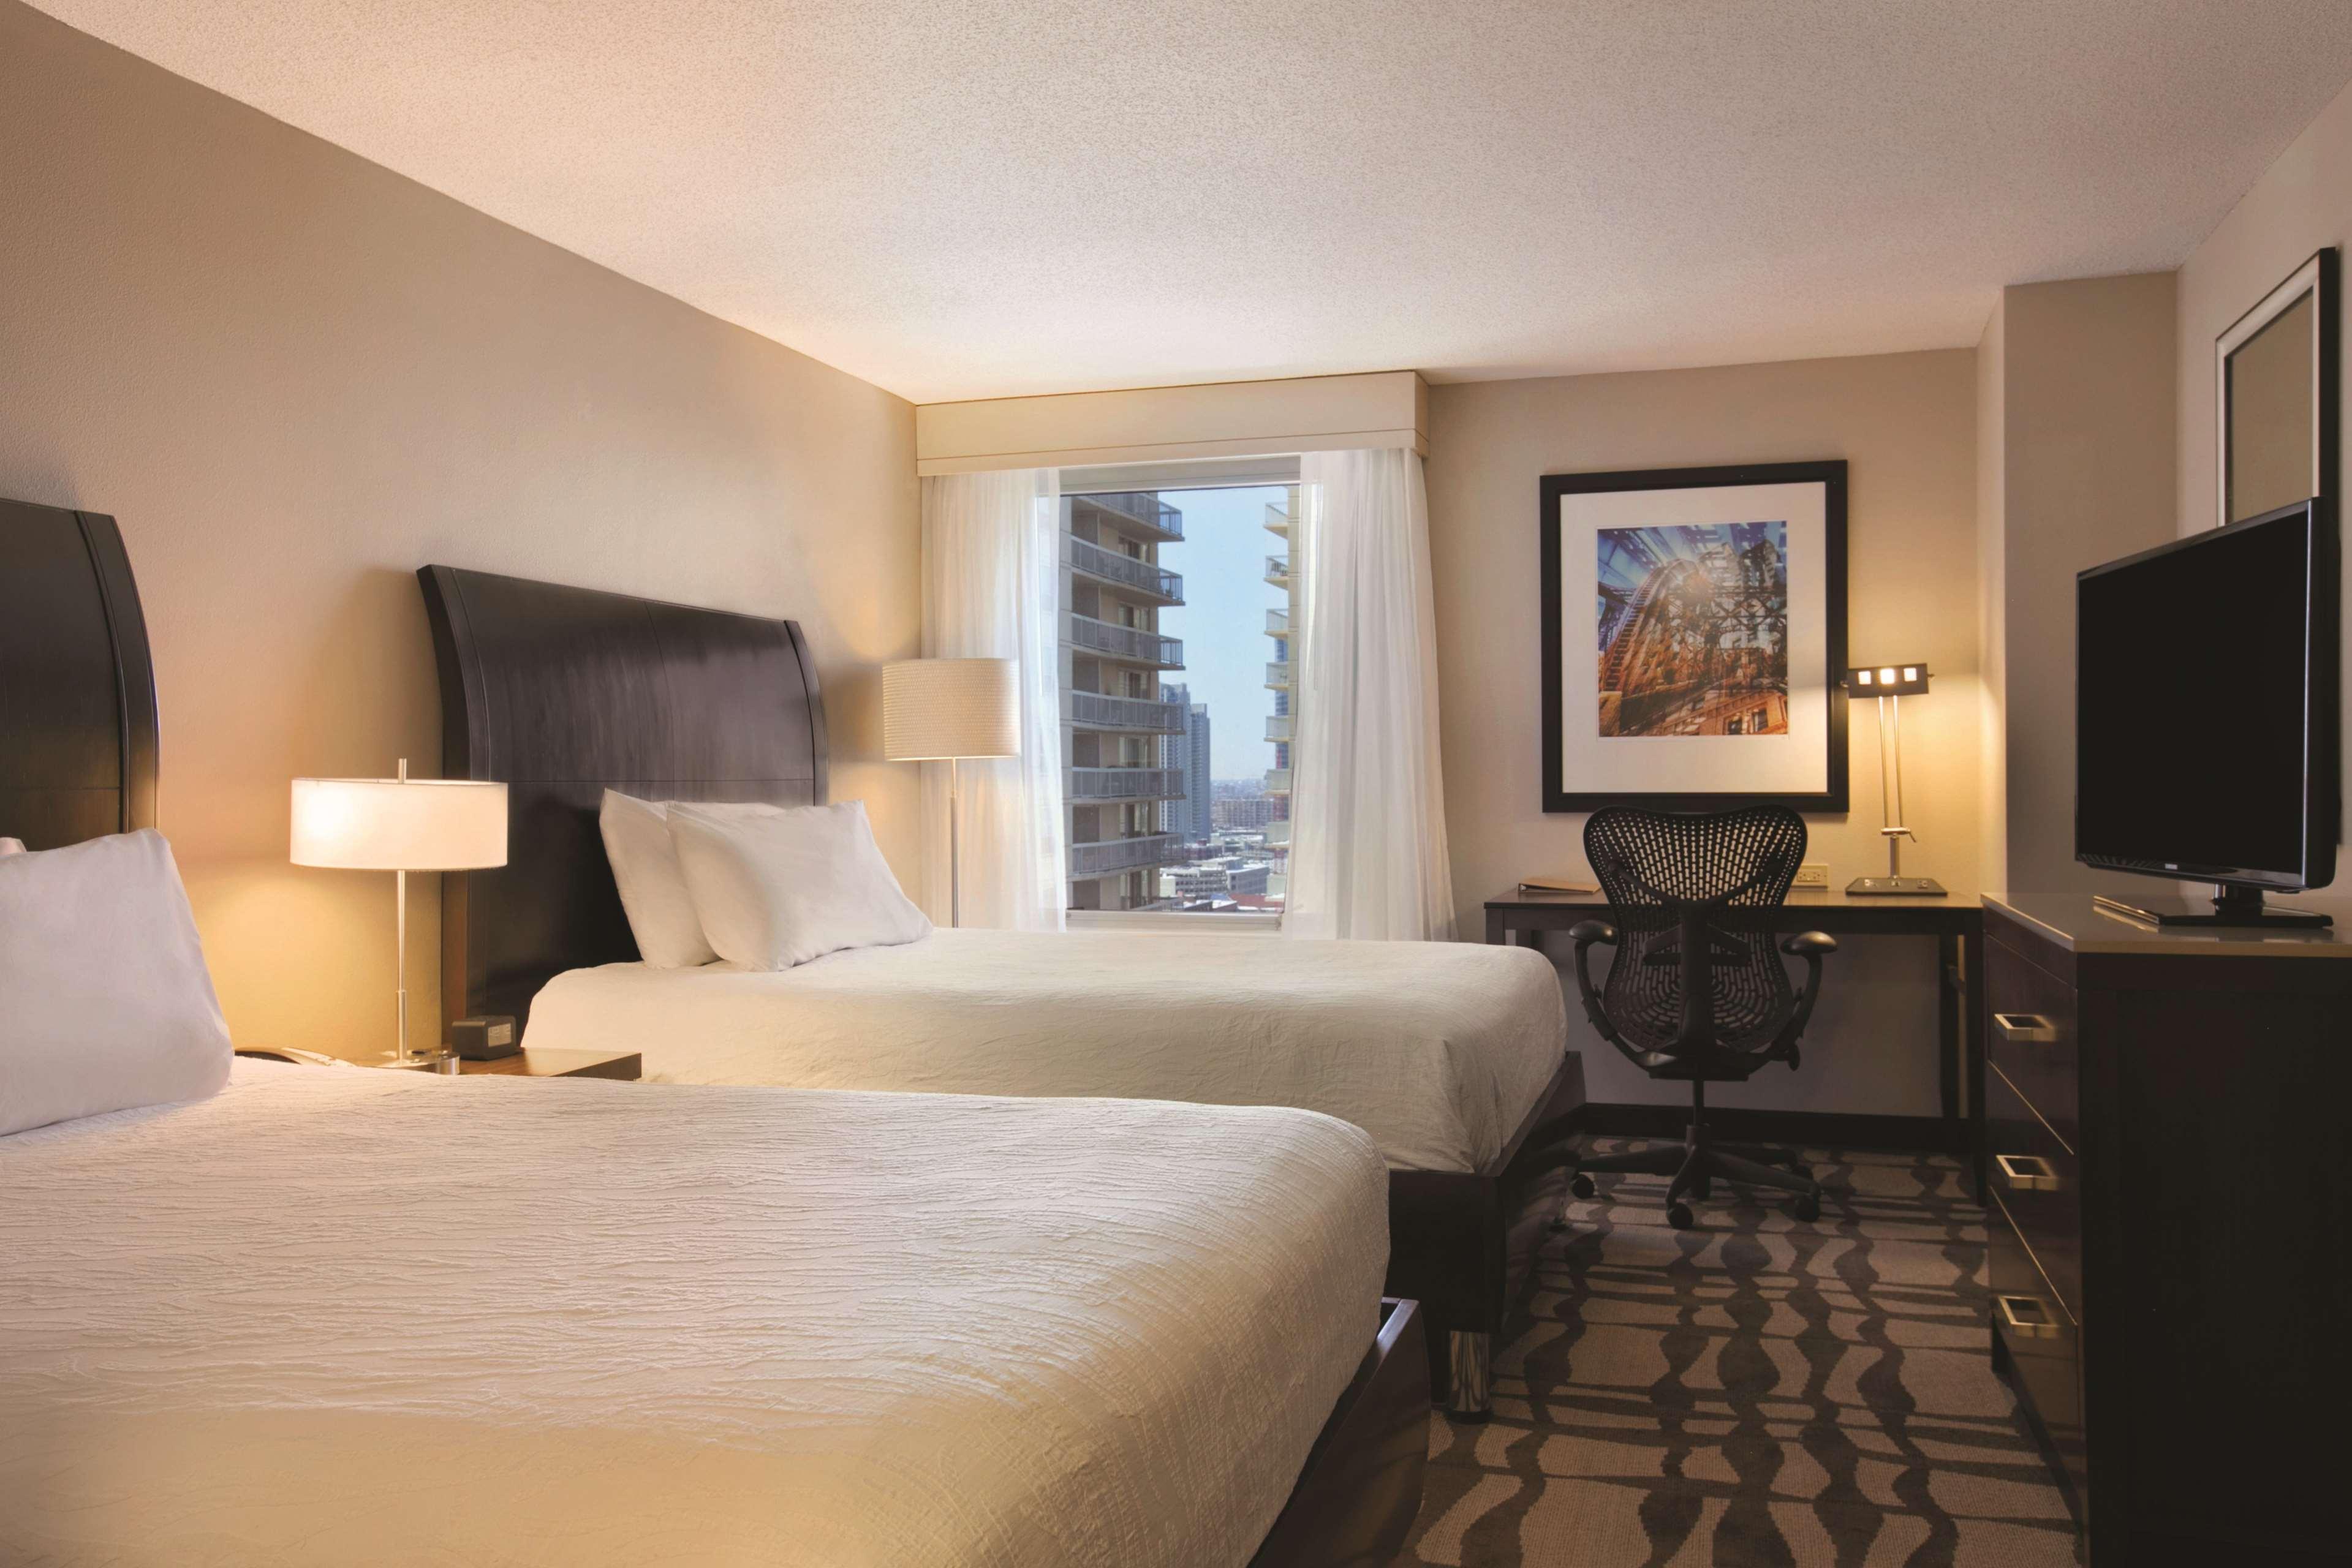 Hilton Garden Inn Chicago Downtown/Magnificent Mile image 21